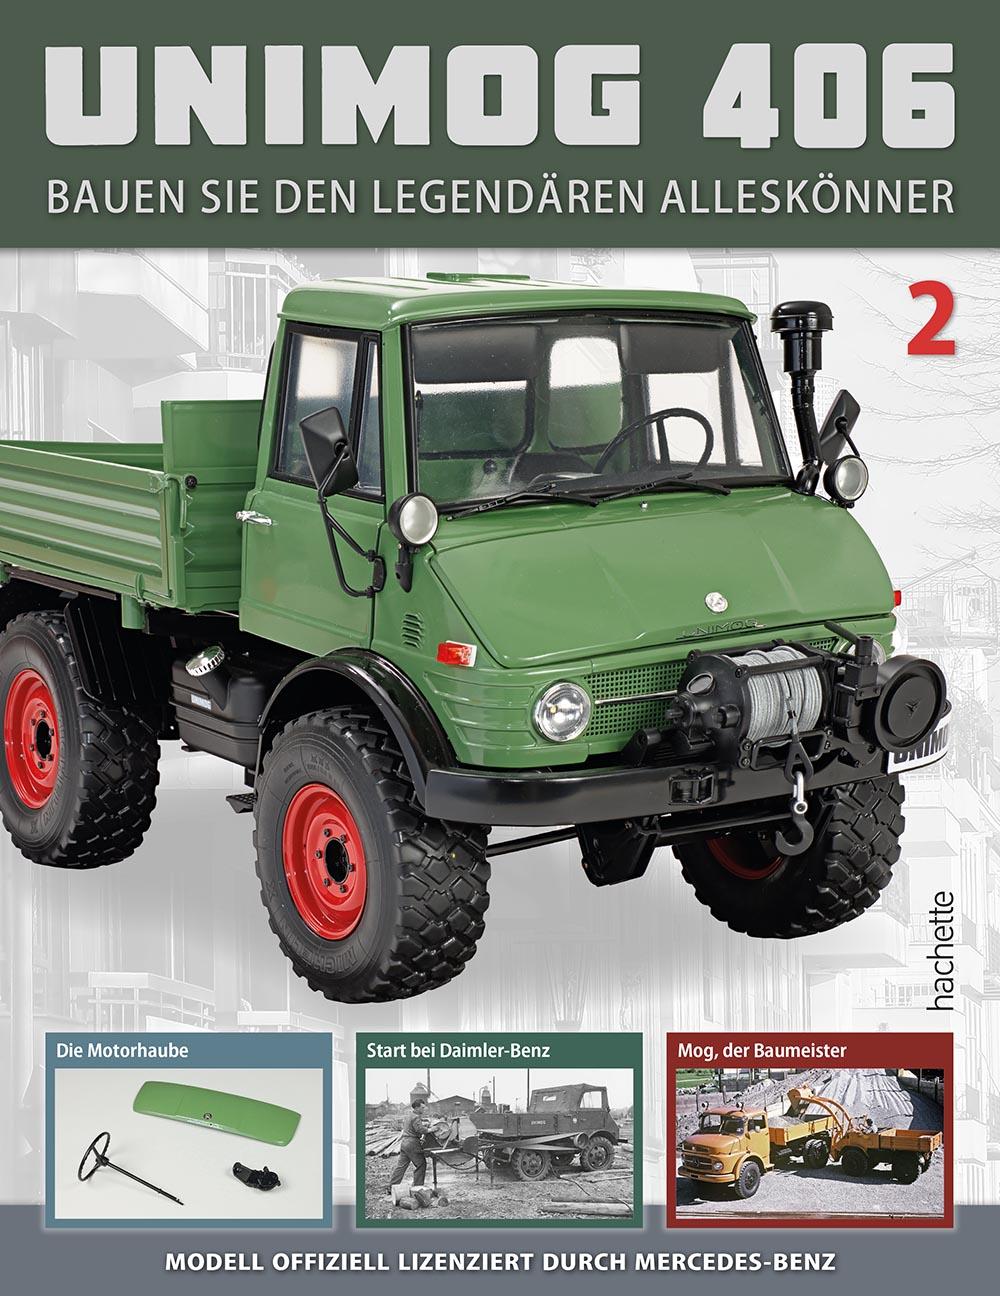 Unimog 406 - Ausgabe 002